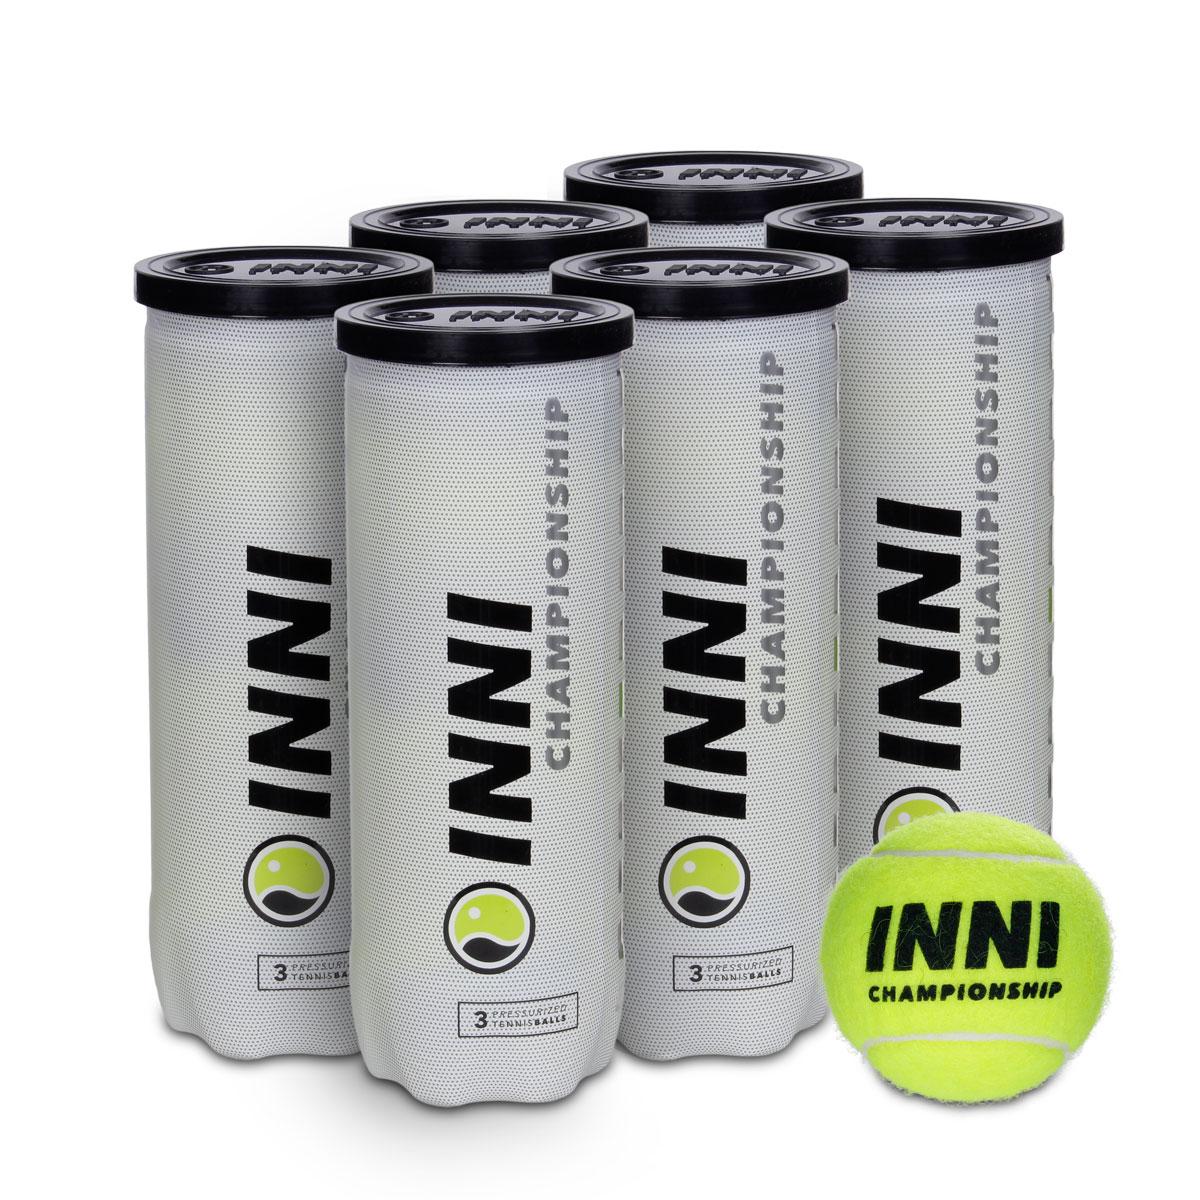 Bola de Tenis INNI Championship PACK com 6 Tubos